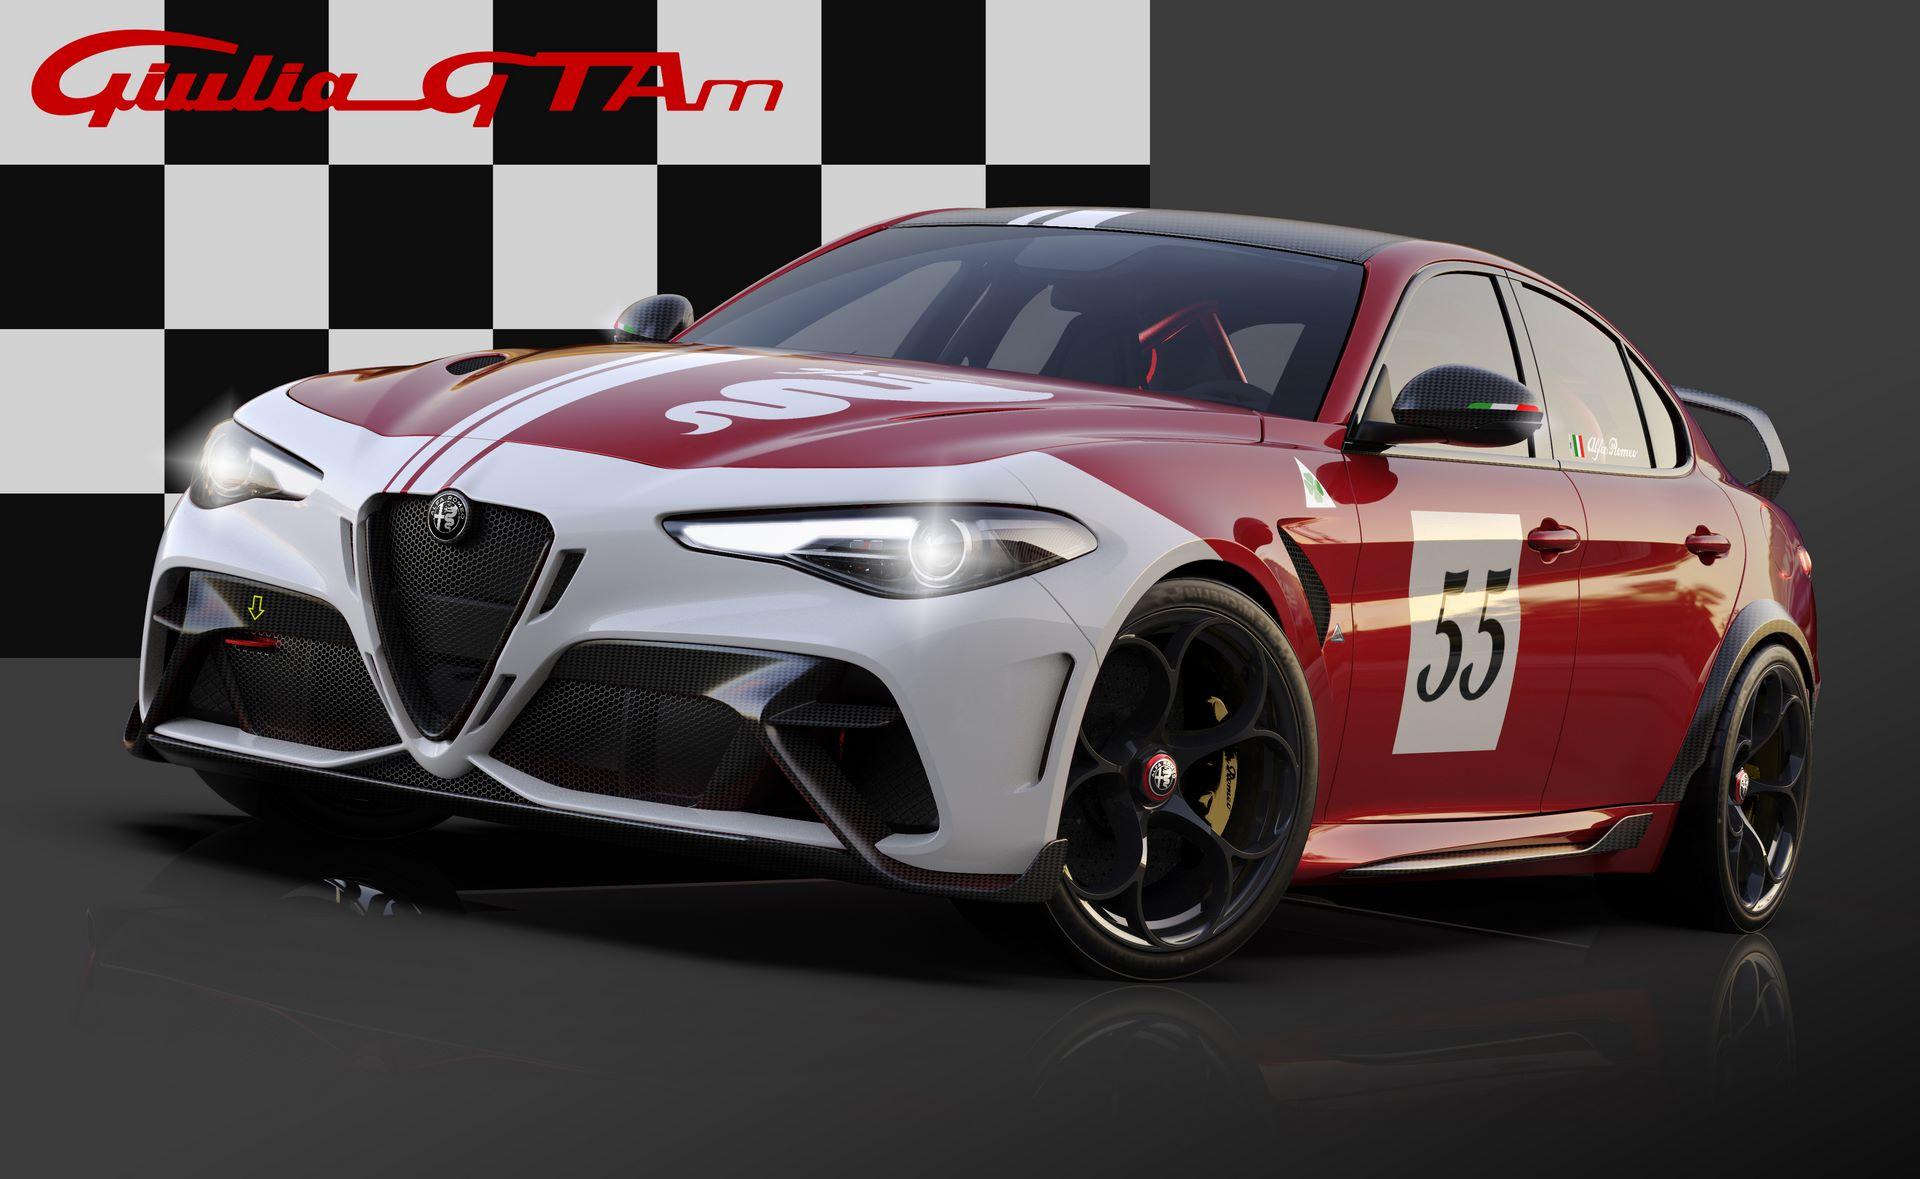 12_Alfa-Romeo-Giulia-GTA-dedicated-Livery